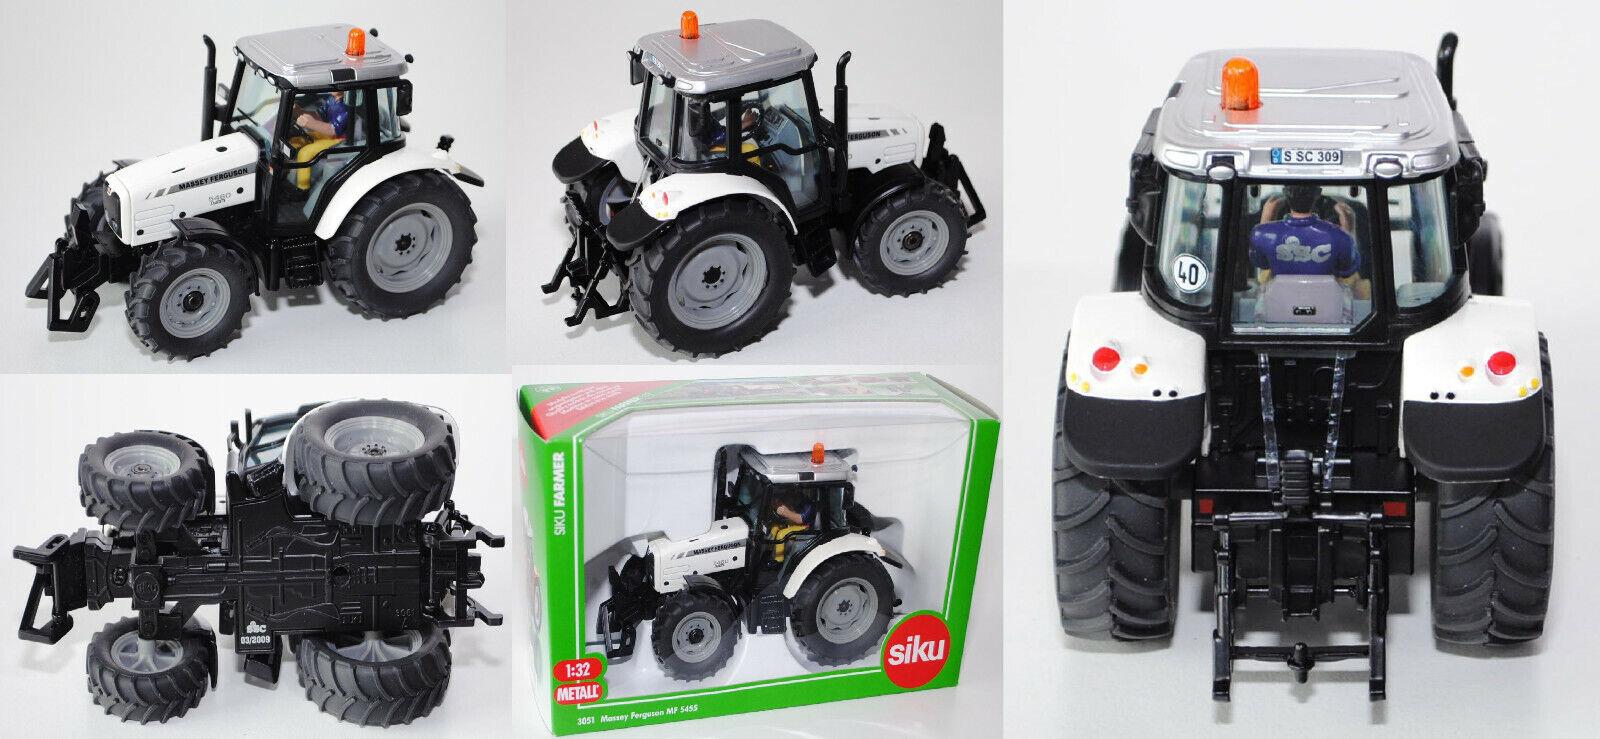 SIKU FARMER 3051 00404 Massey Ferguson 5460, blancalu, SSC Spécial Modèle 2009 1 32